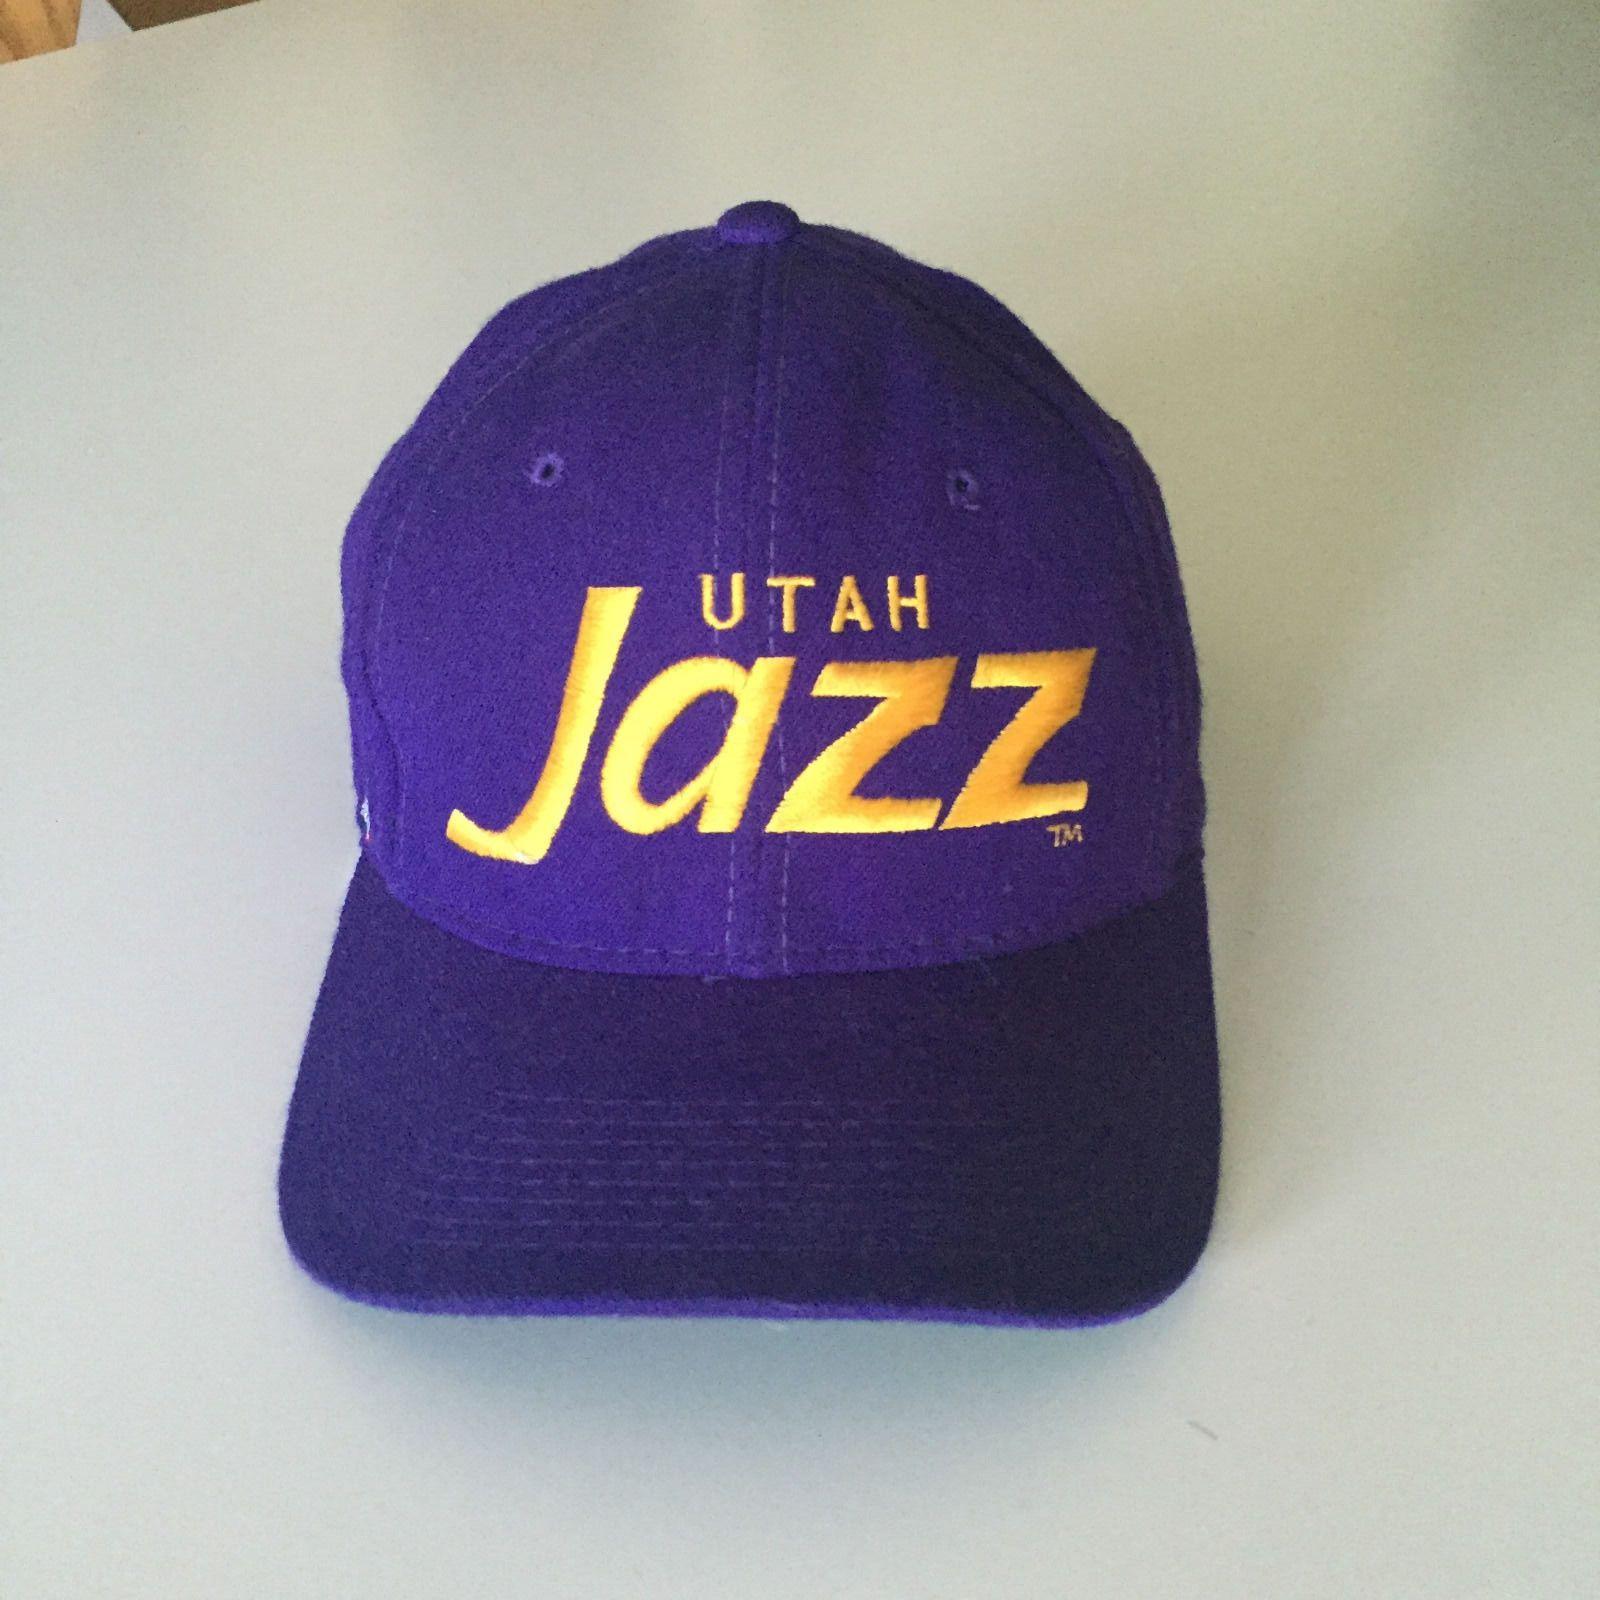 02f440b09c4 Vintage Utah Jazz Sports Specialties Snapback